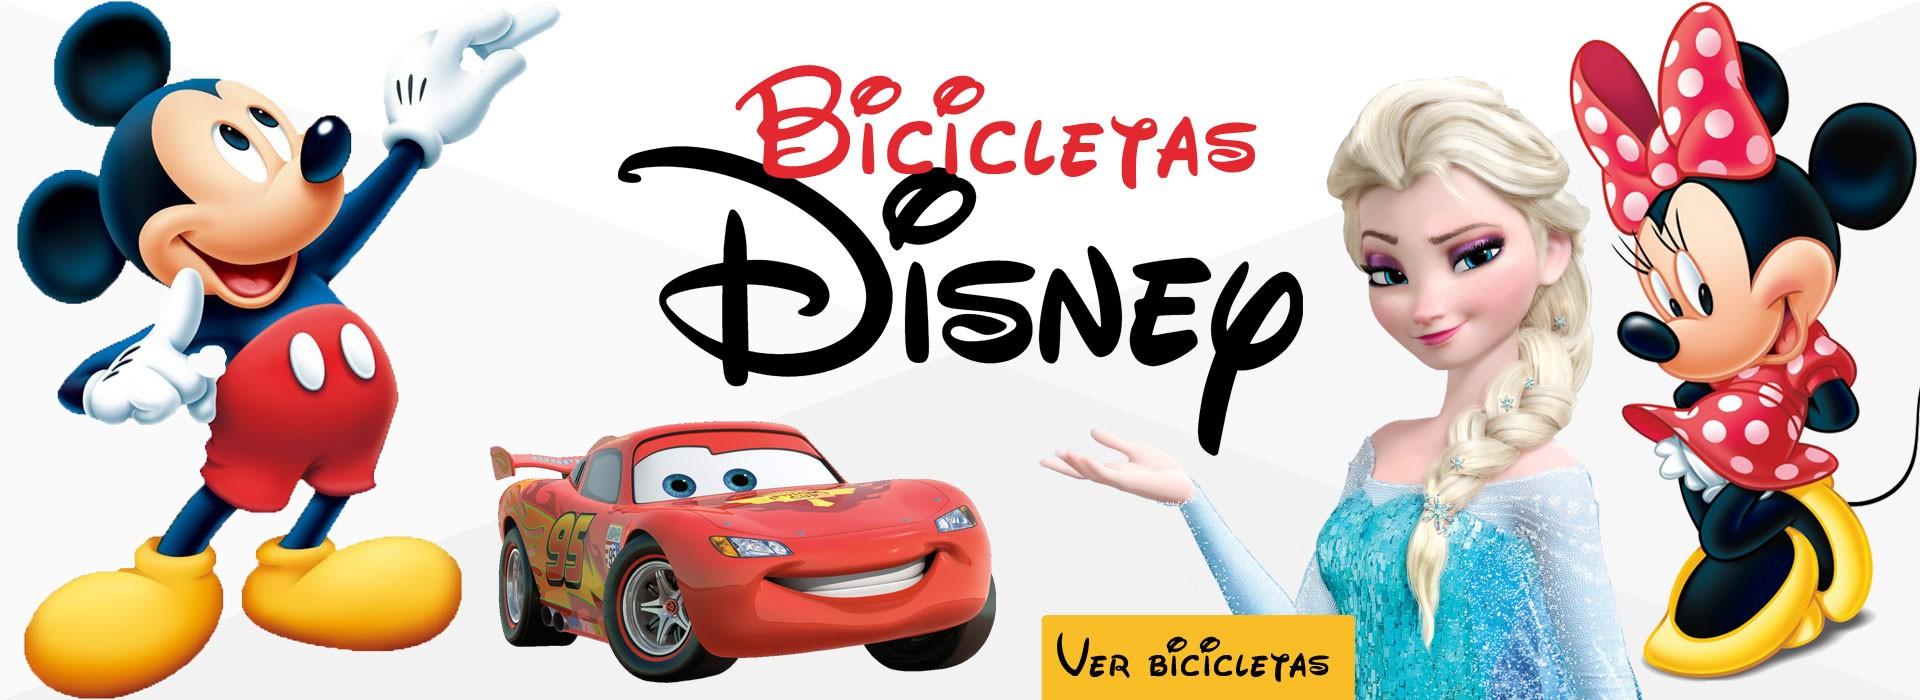 BICICLETAS DISNEY